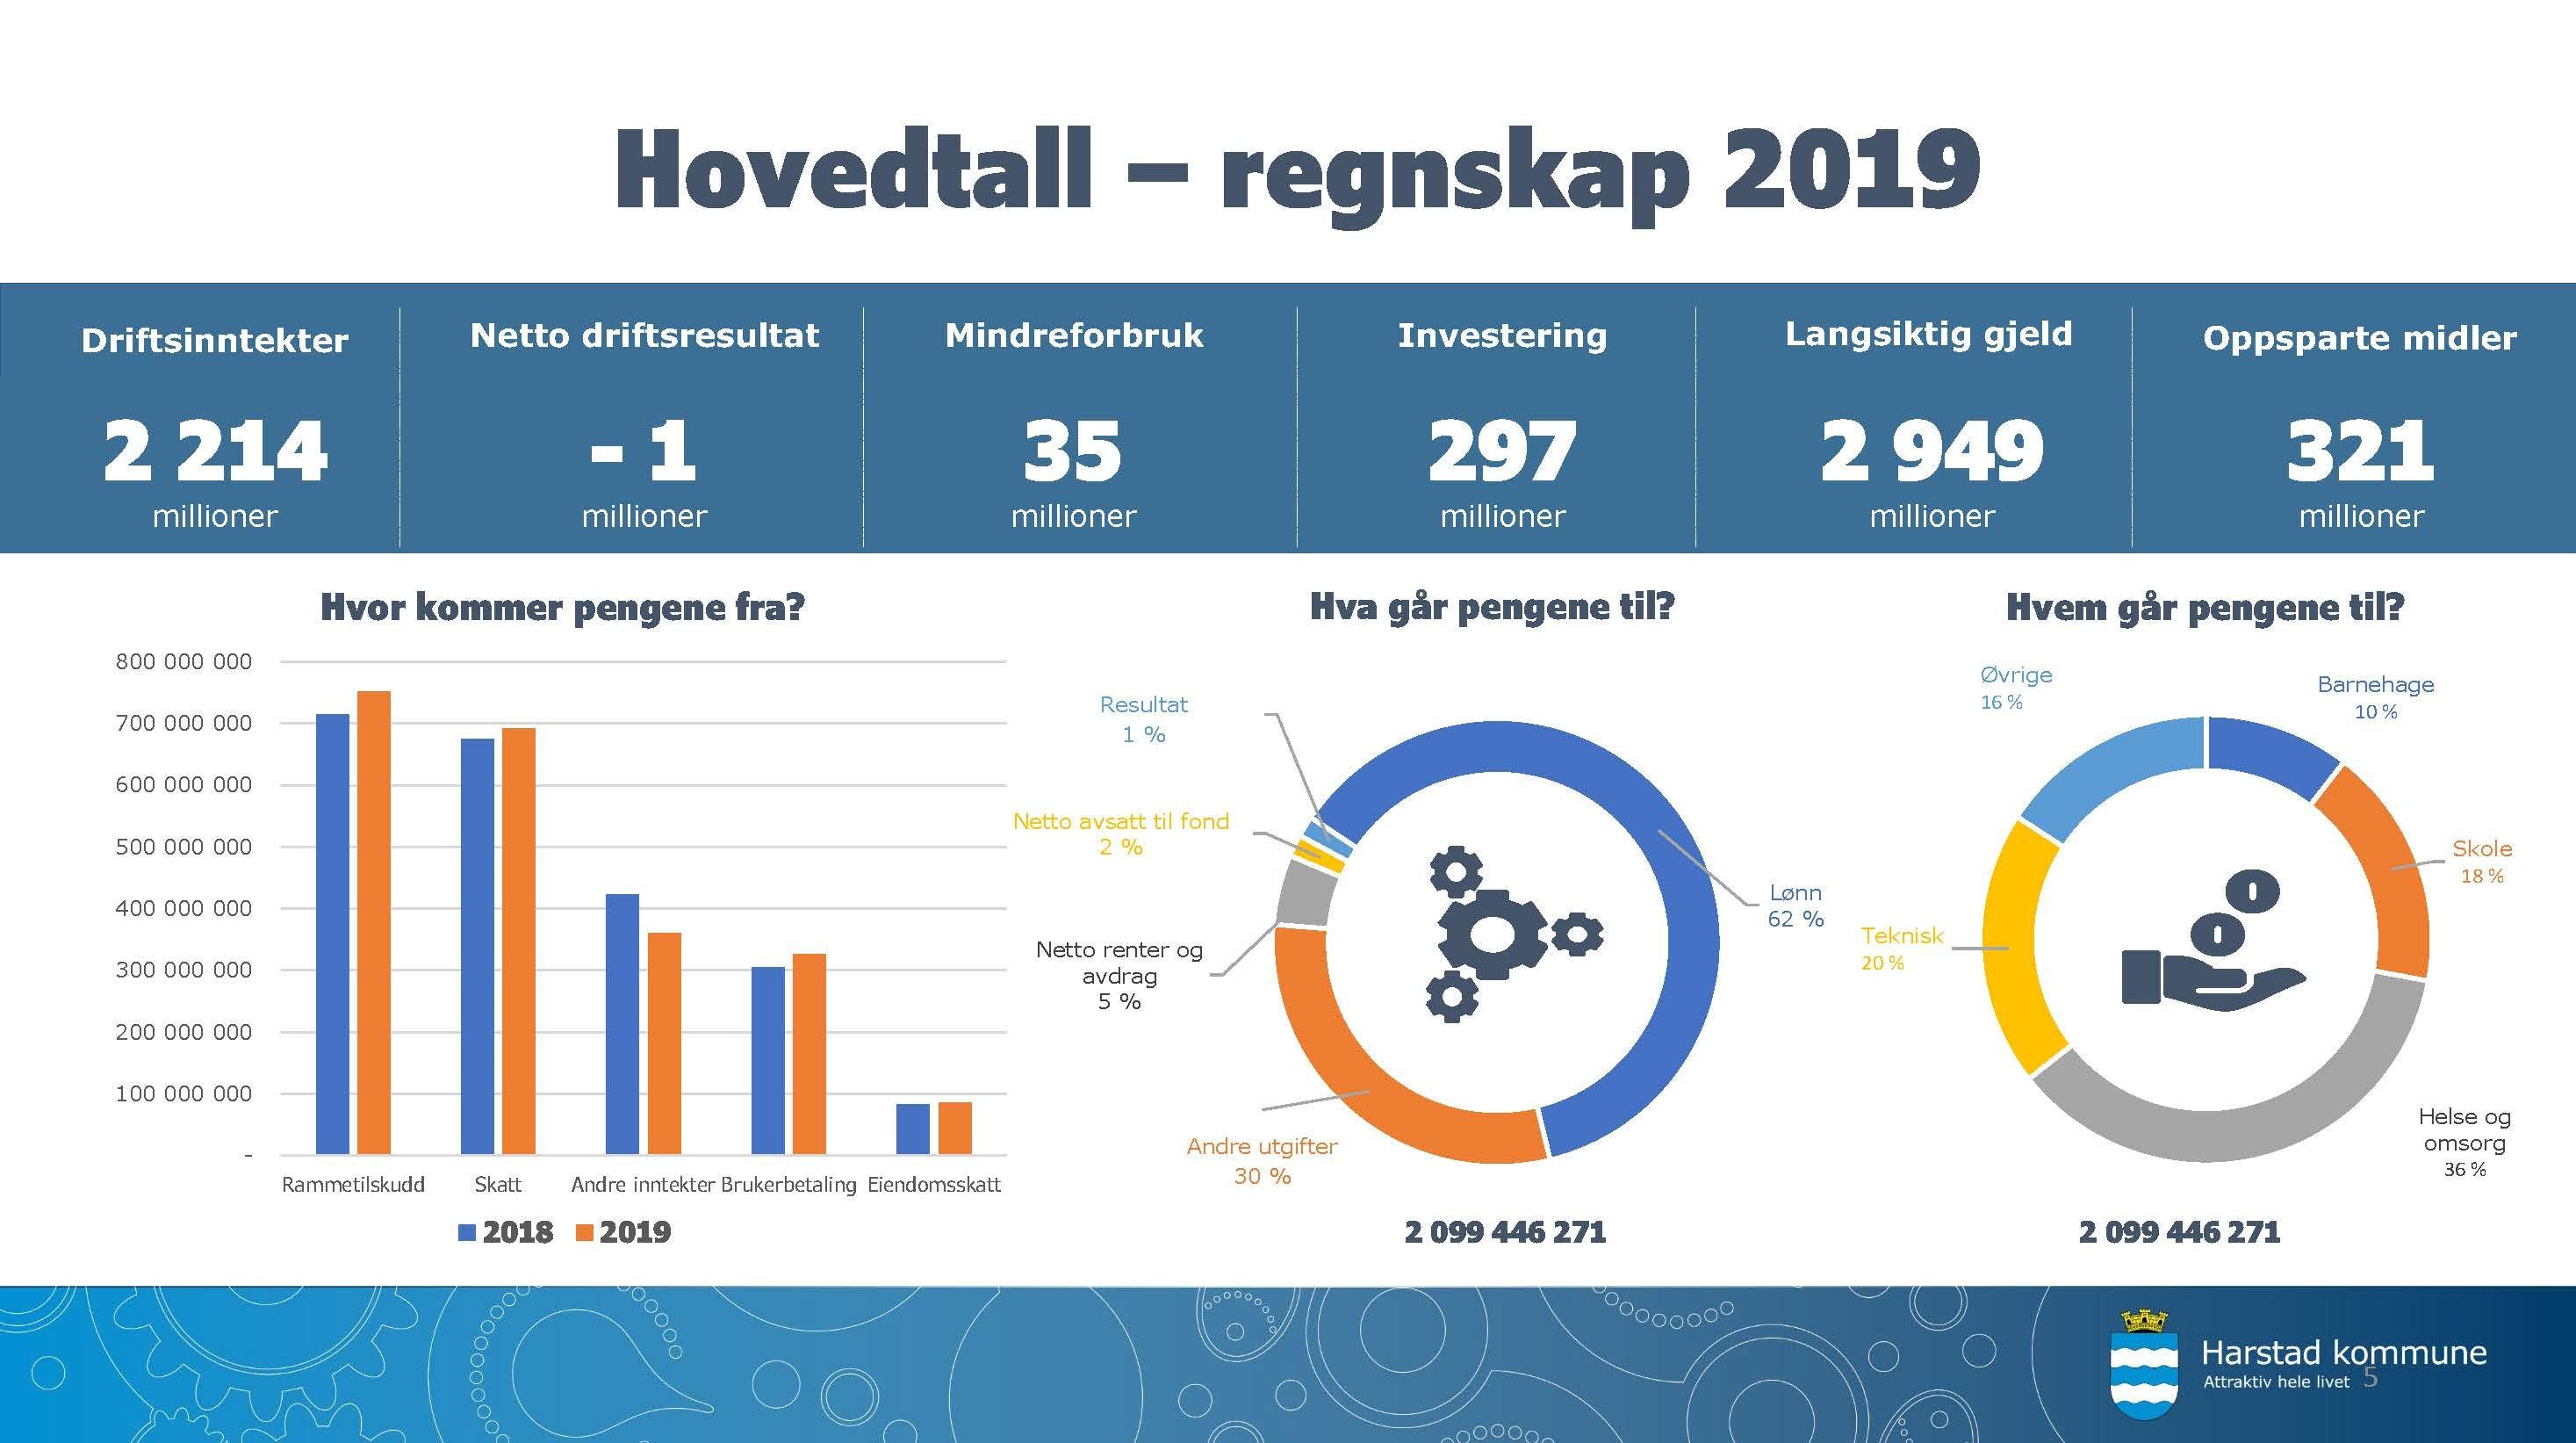 Hovedtall Regnskap 2019.jpg